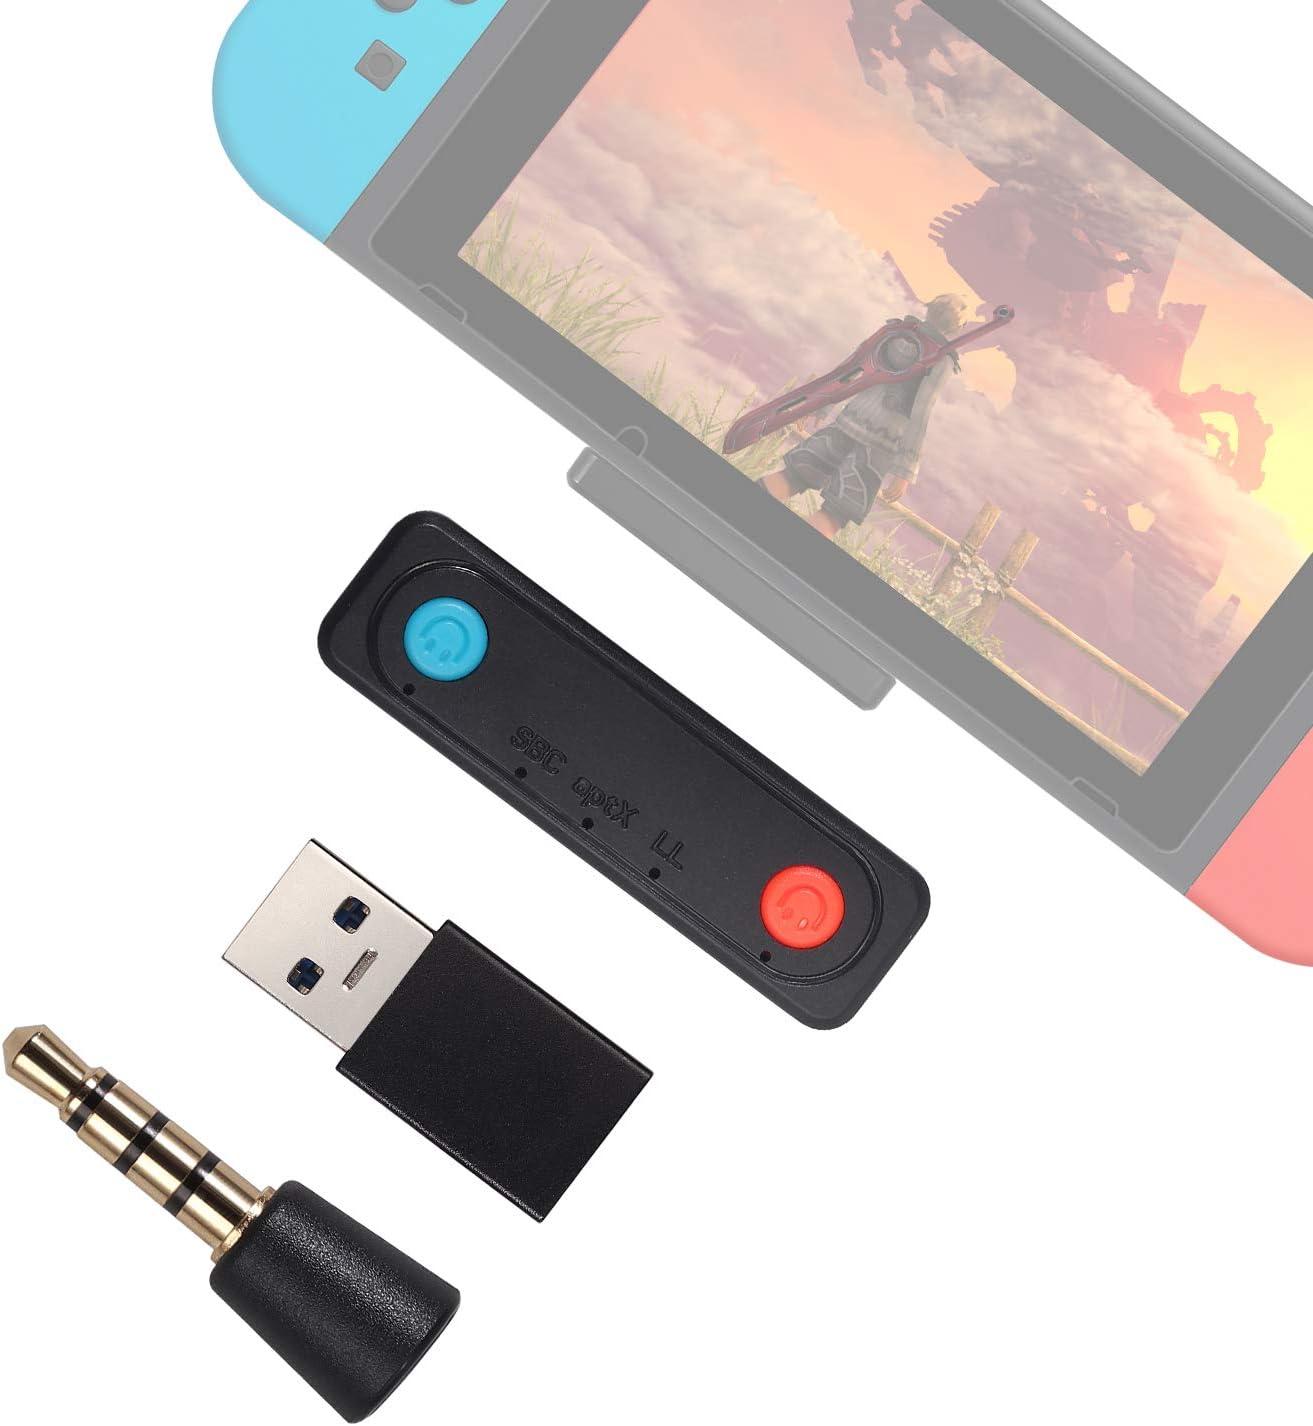 Transmisor Bluetooth apt-X USB Type-C Adaptador de Audio Bluetooth 5.0 Baja Latencia con Conector USB-C a USB-A y Micrófono Externo para PS4 Switch/Switch Lite TV PC Android Móviles Amplificador